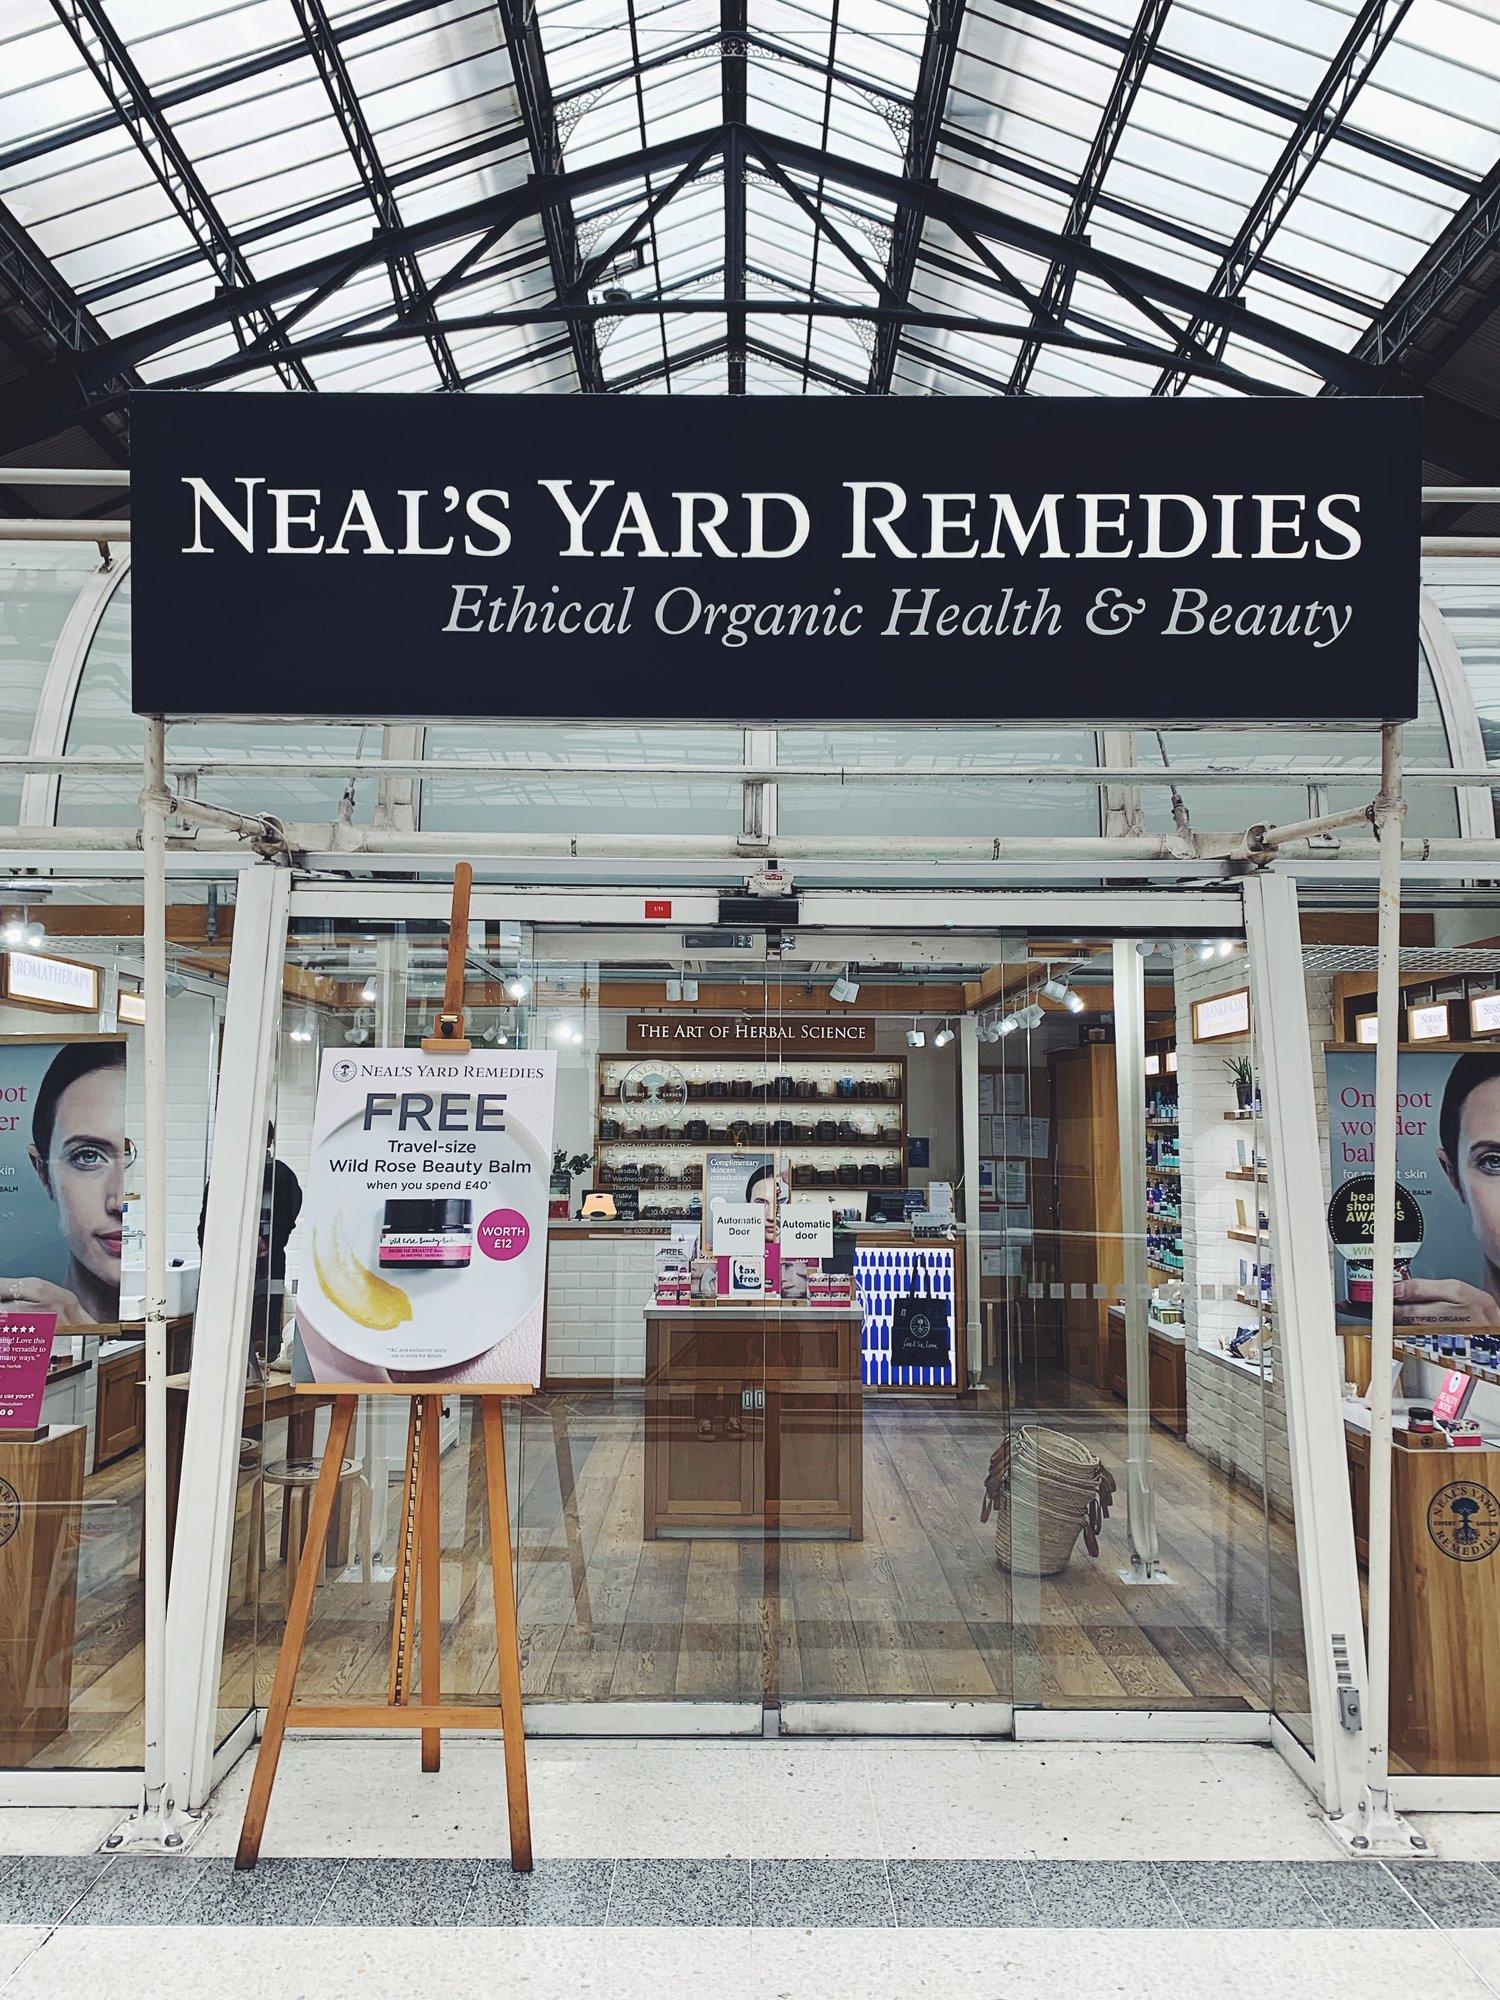 neal's yard remedies — Blog — My Little Duke